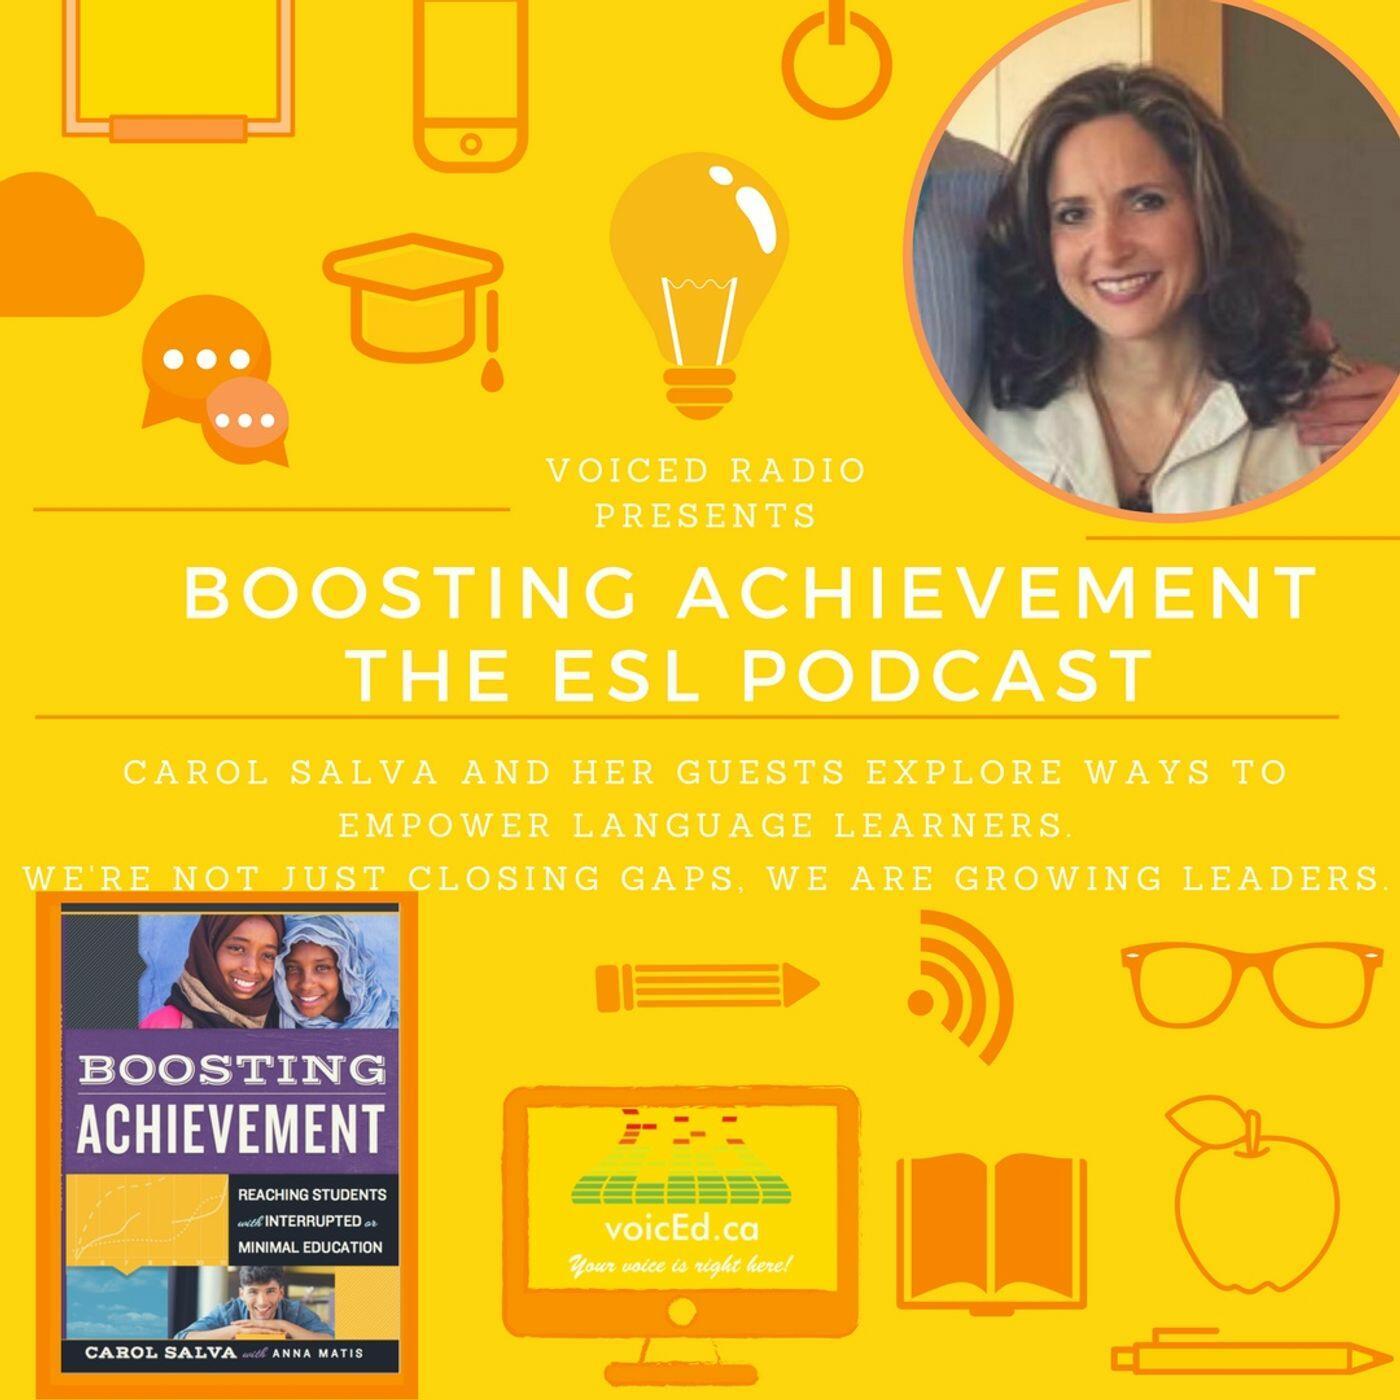 Boosting Achievement: The ESL Podcast